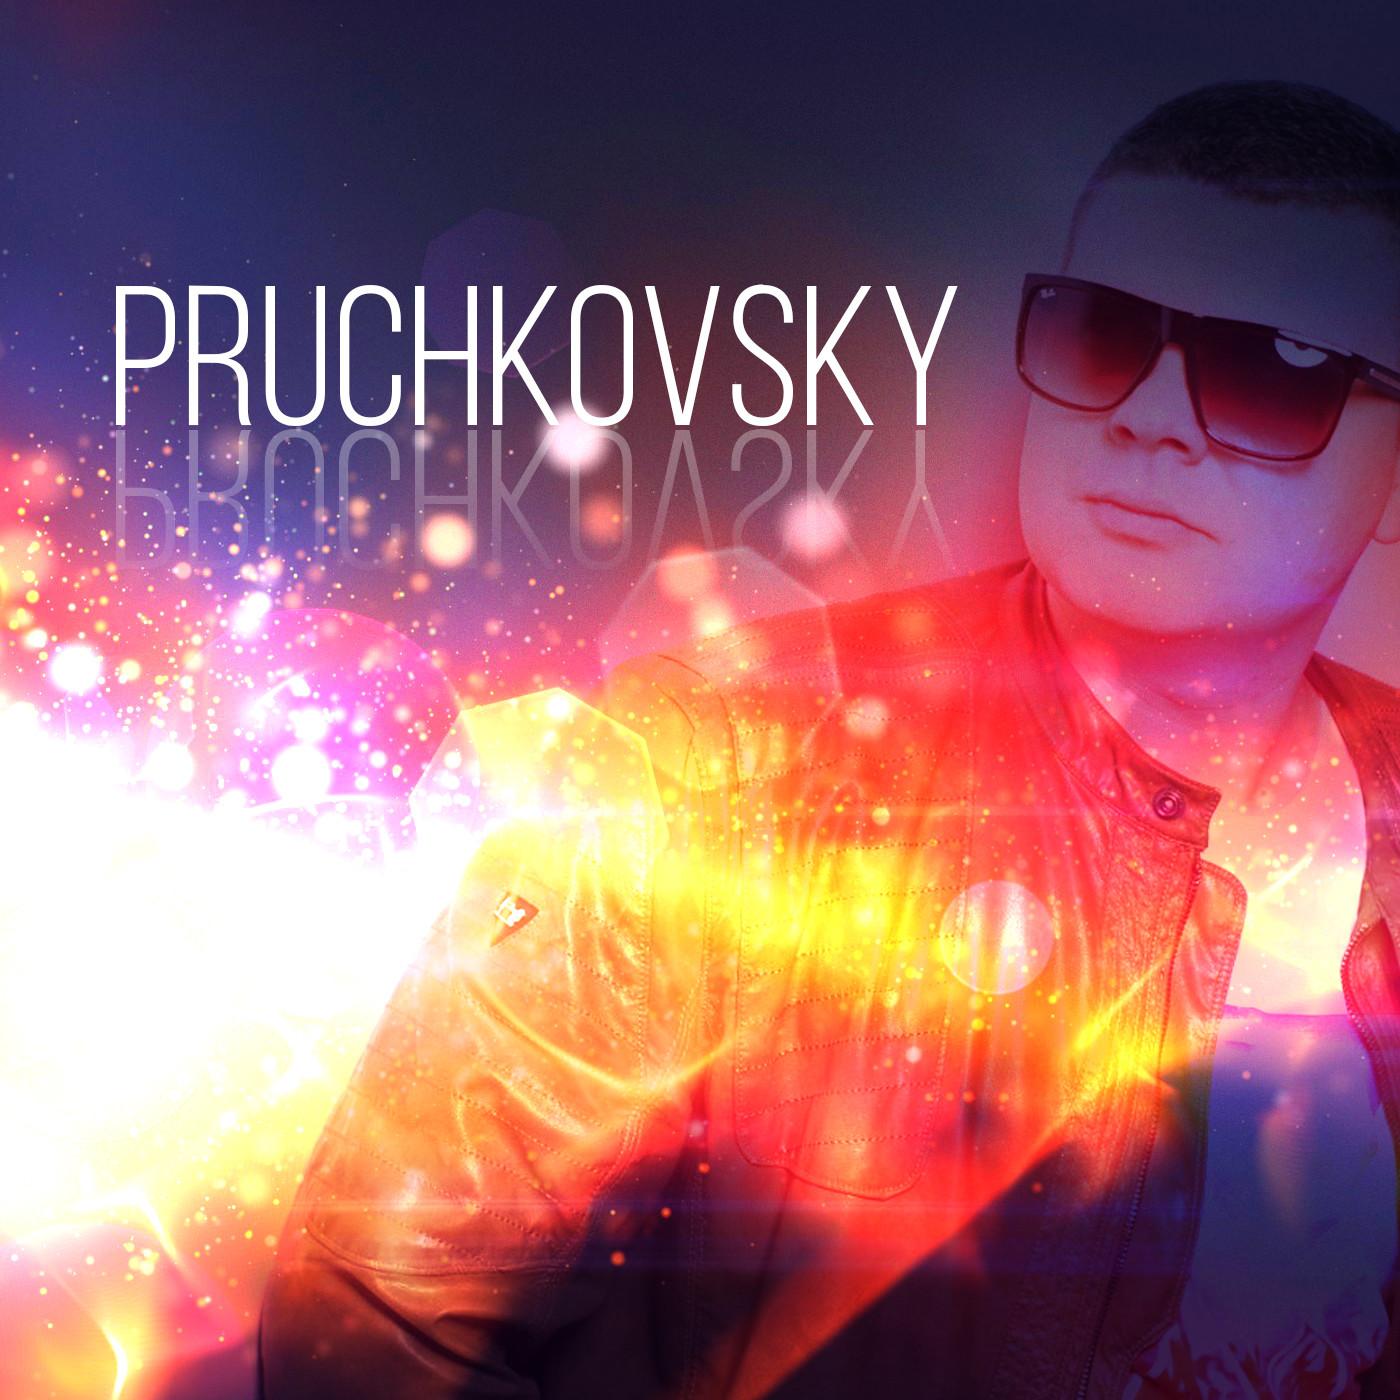 DJ PRUCHKOVSKY aka Two Killers